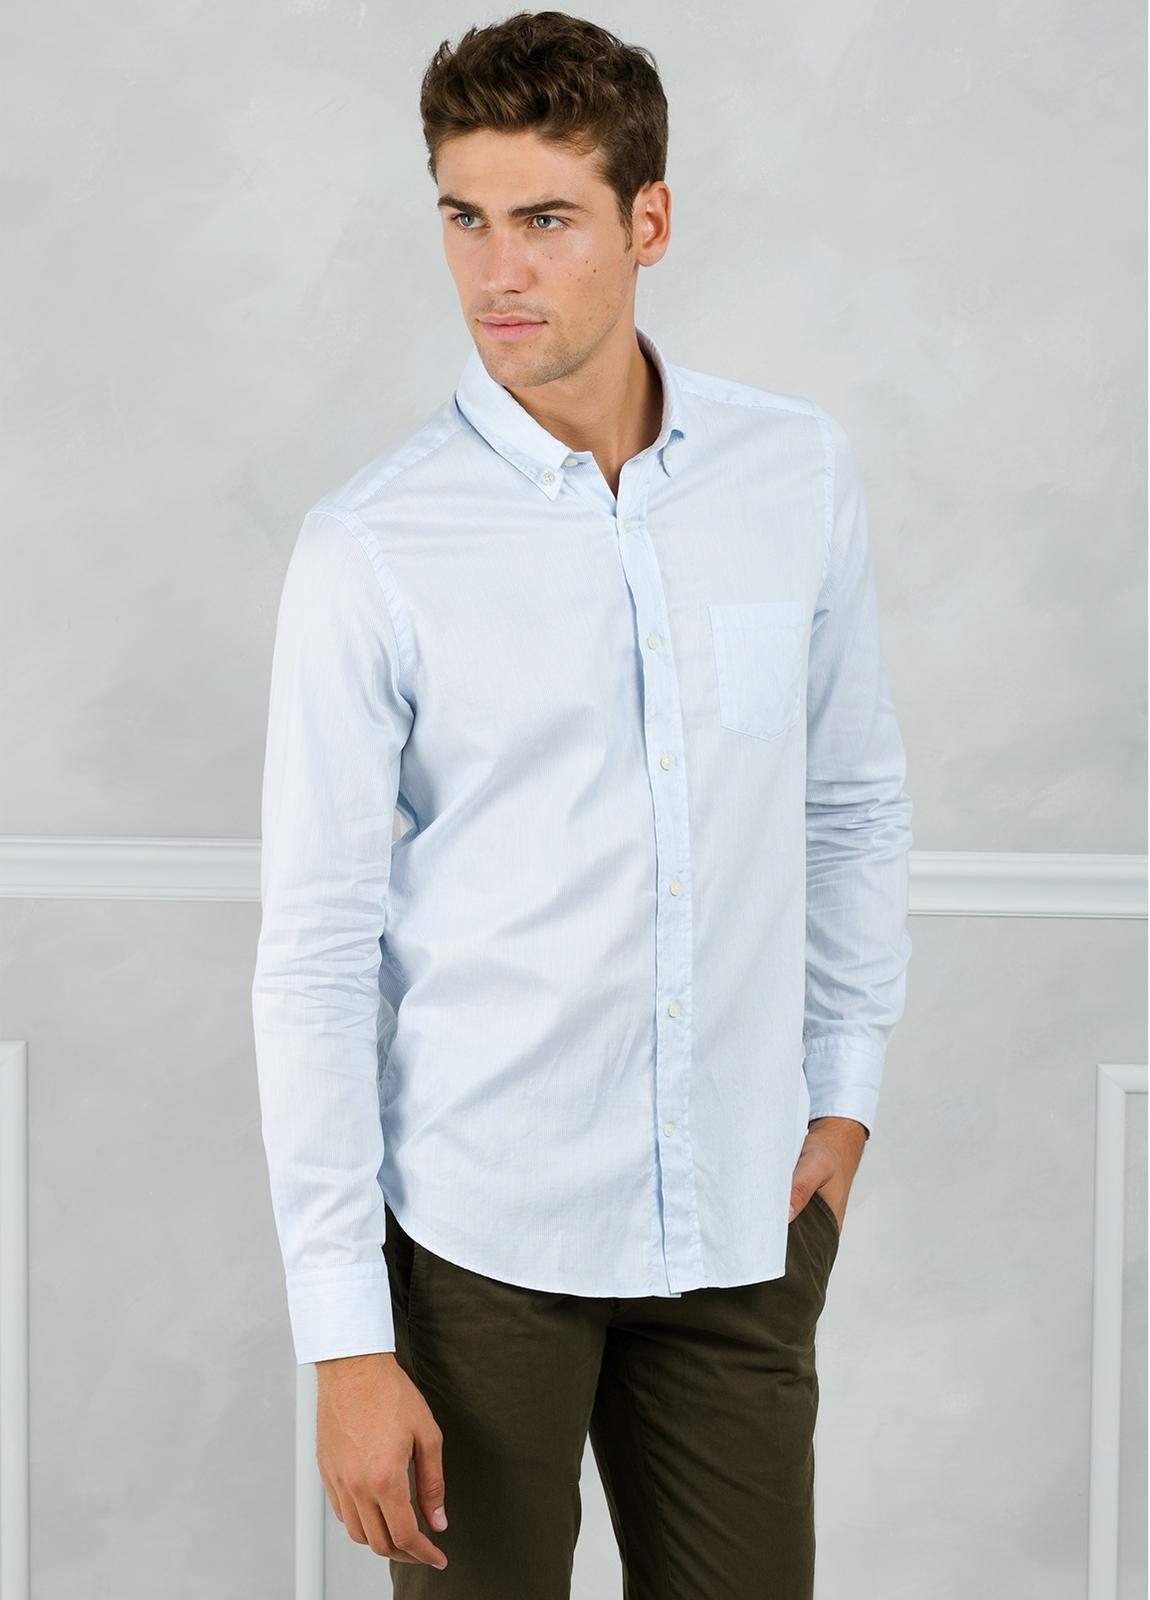 Camisa Leisure Wear REGULAR FIT Modelo BOTTON DOWN color celeste. 100% Algodón.